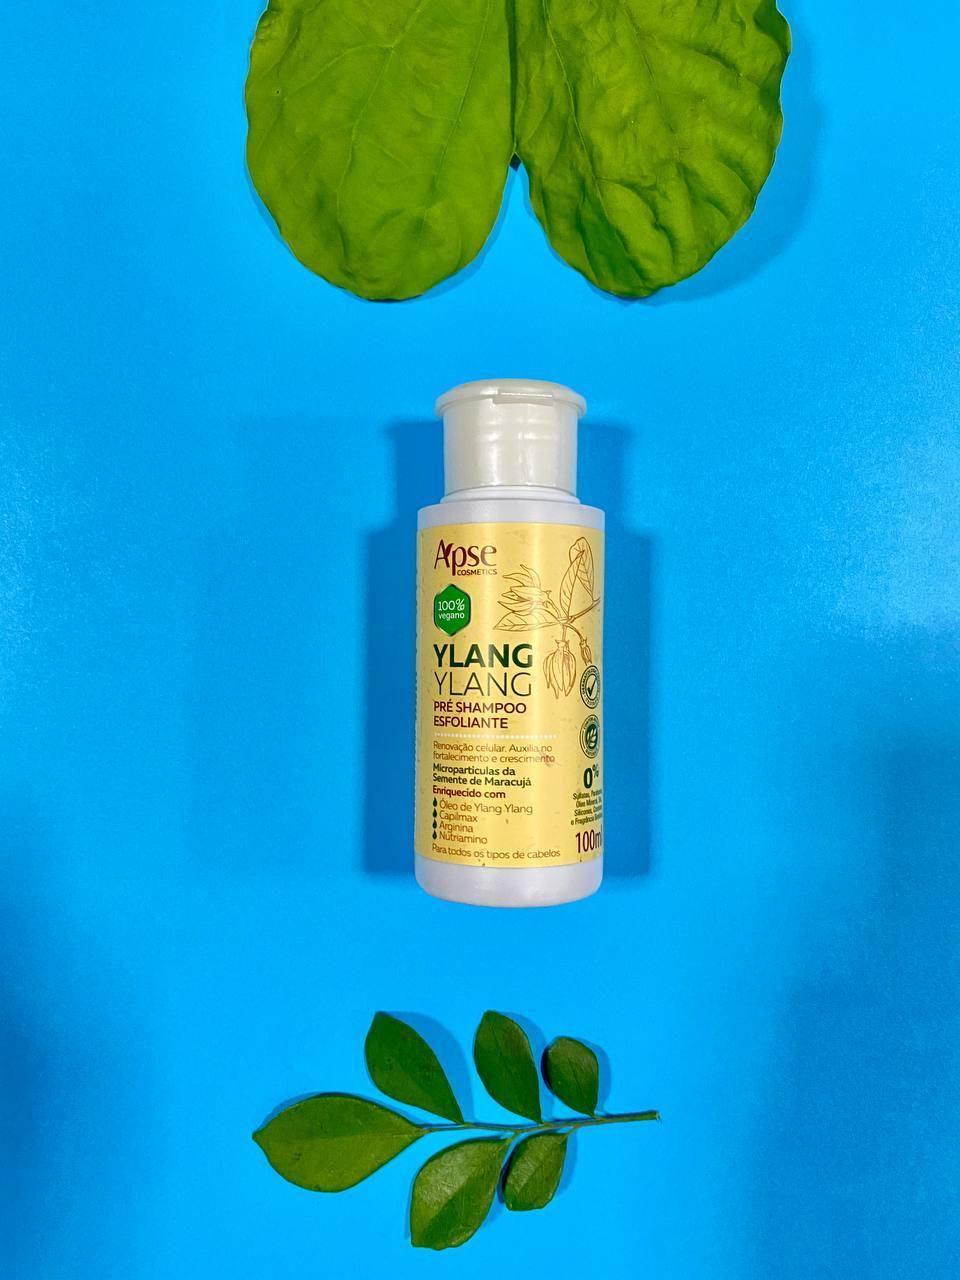 Pré Shampoo Esfoliante Ylang Ylang - Apse Cosmetics 100ml